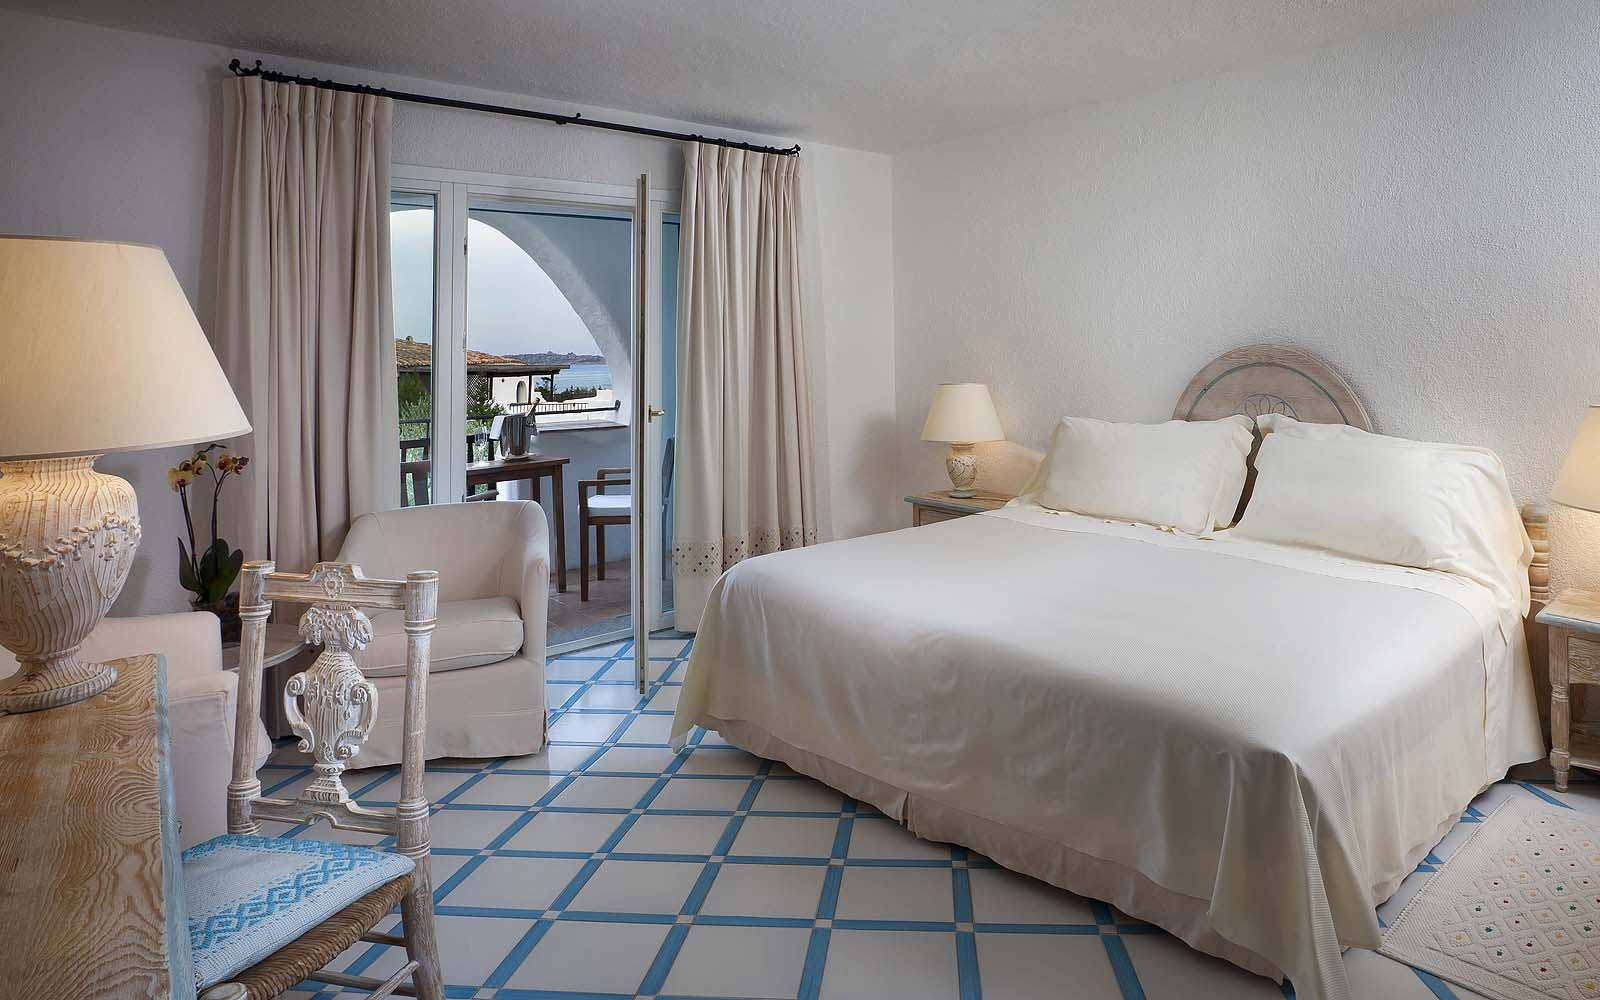 A Superior Room at the Hotel Romazzino